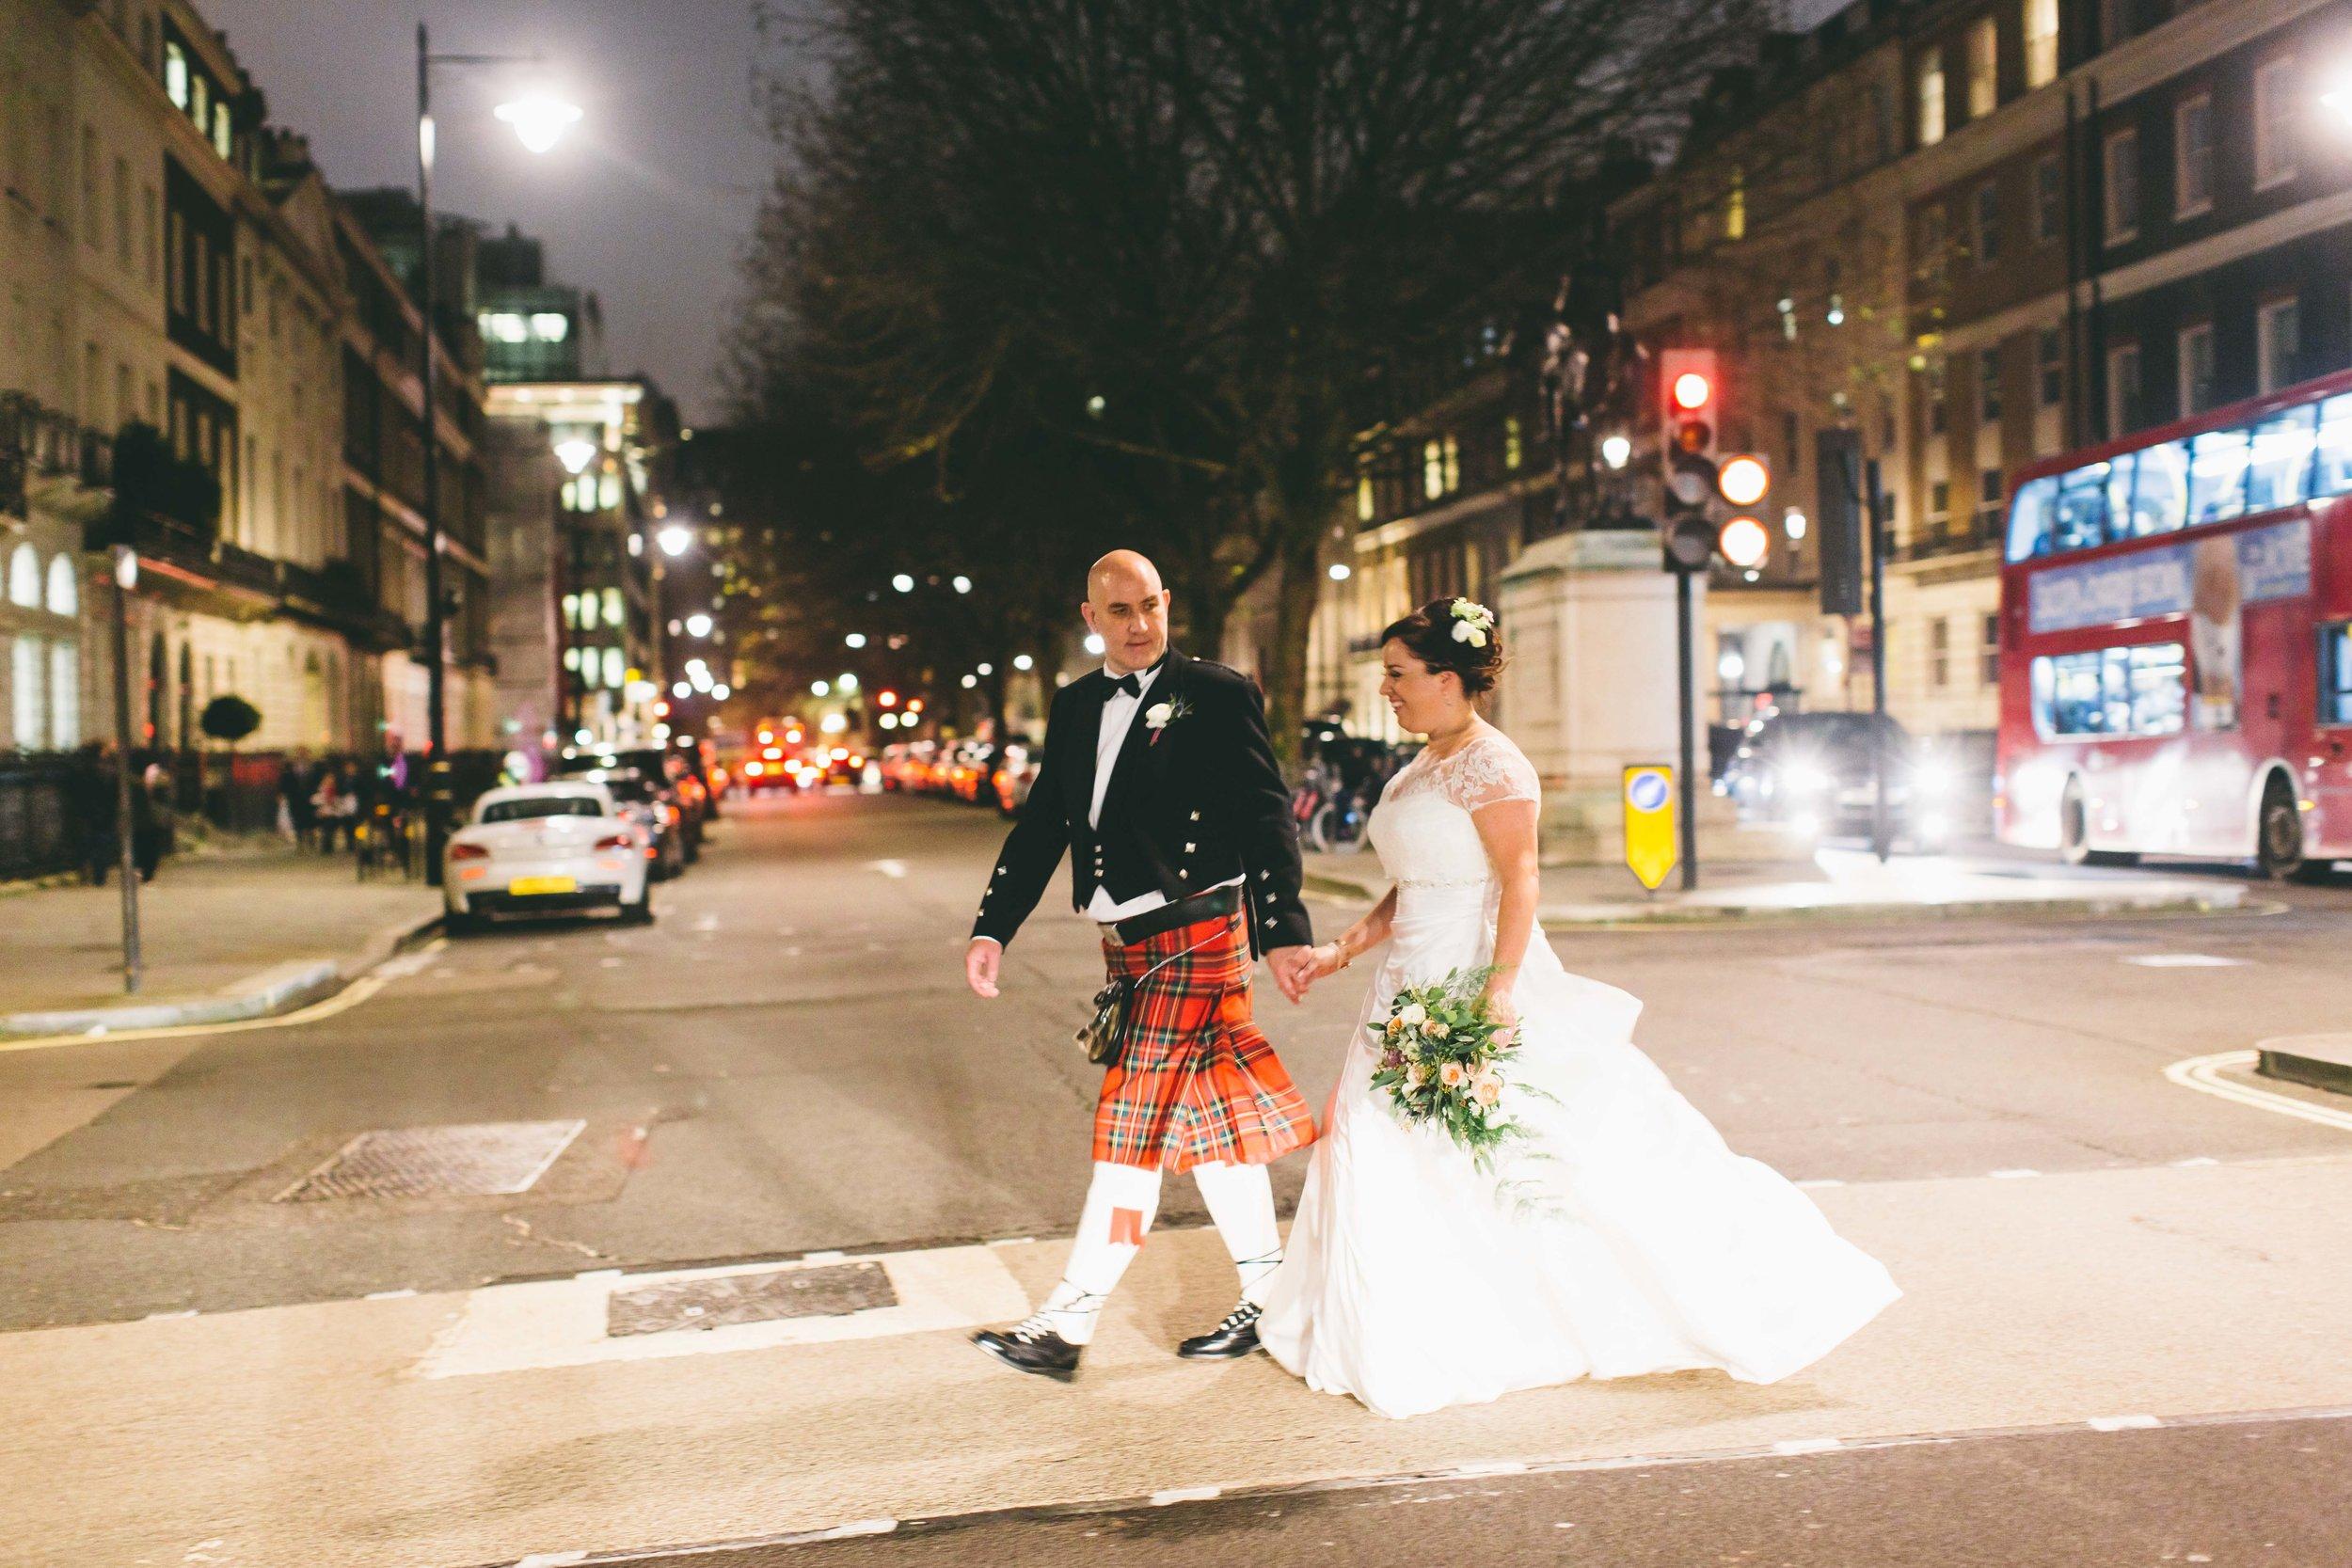 2015.12.06 CALLY DAVE WEDDING-359.jpg